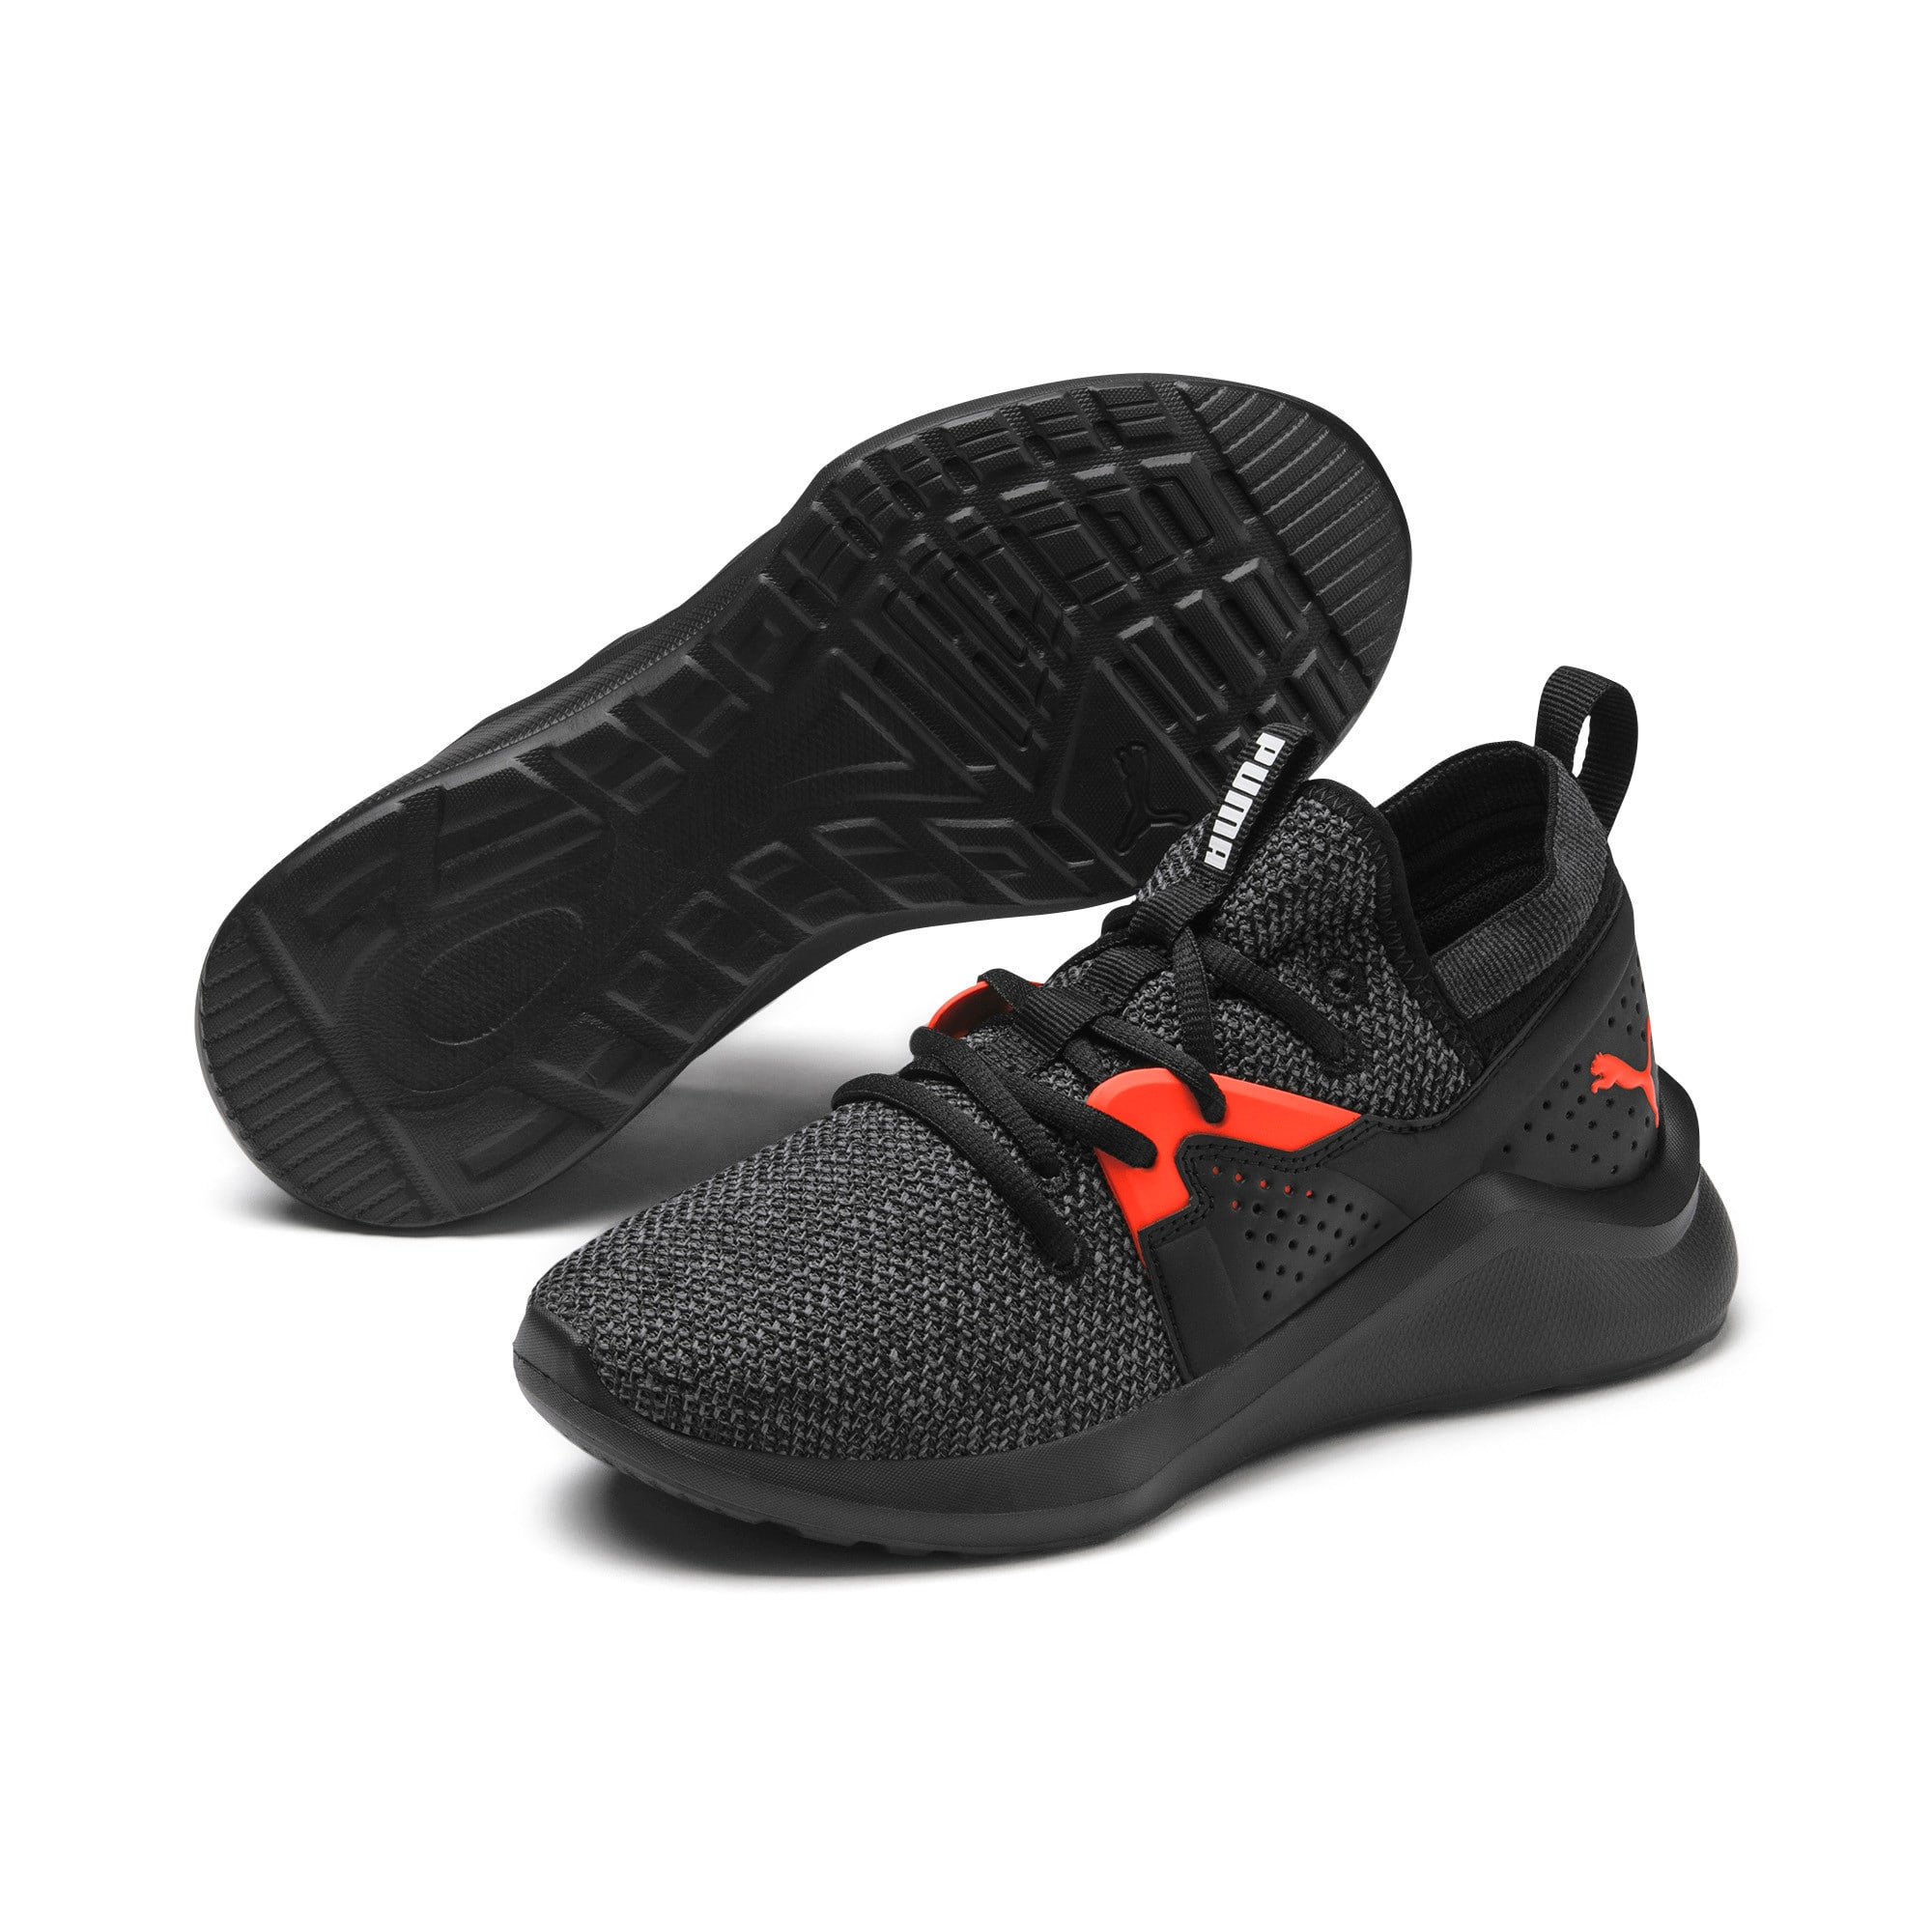 Thumbnail 2 of Emergence Sneakers JR, Puma Black-Cherry Tomato, medium